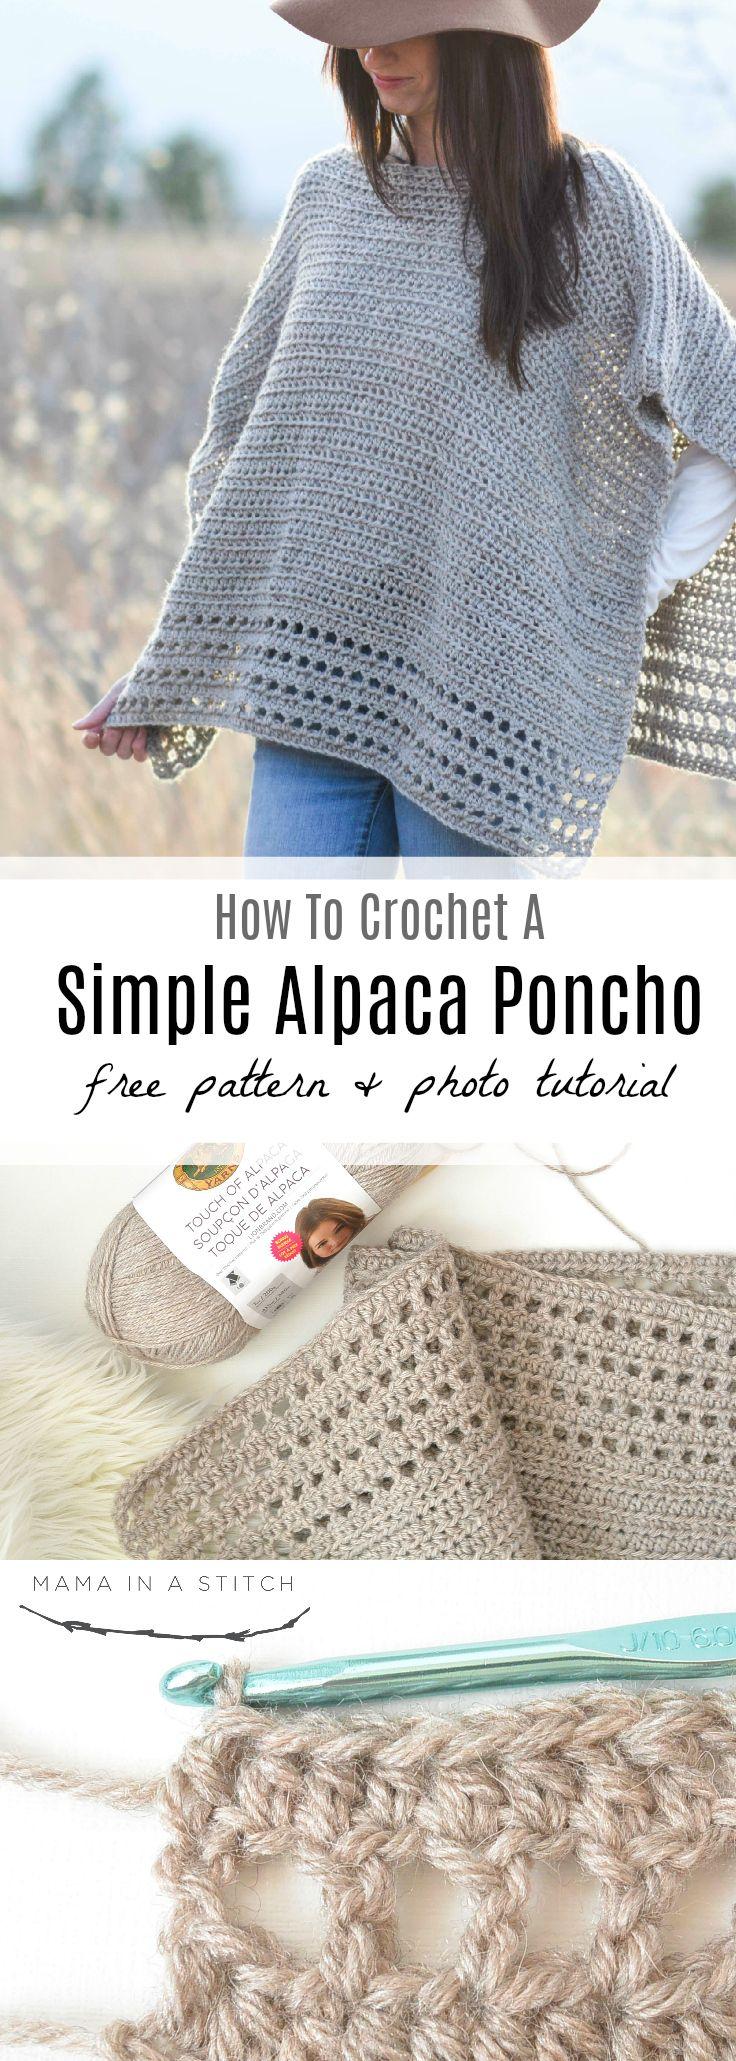 Light Alpaca Poncho Crochet Pattern | Tejido creativo | Pinterest ...